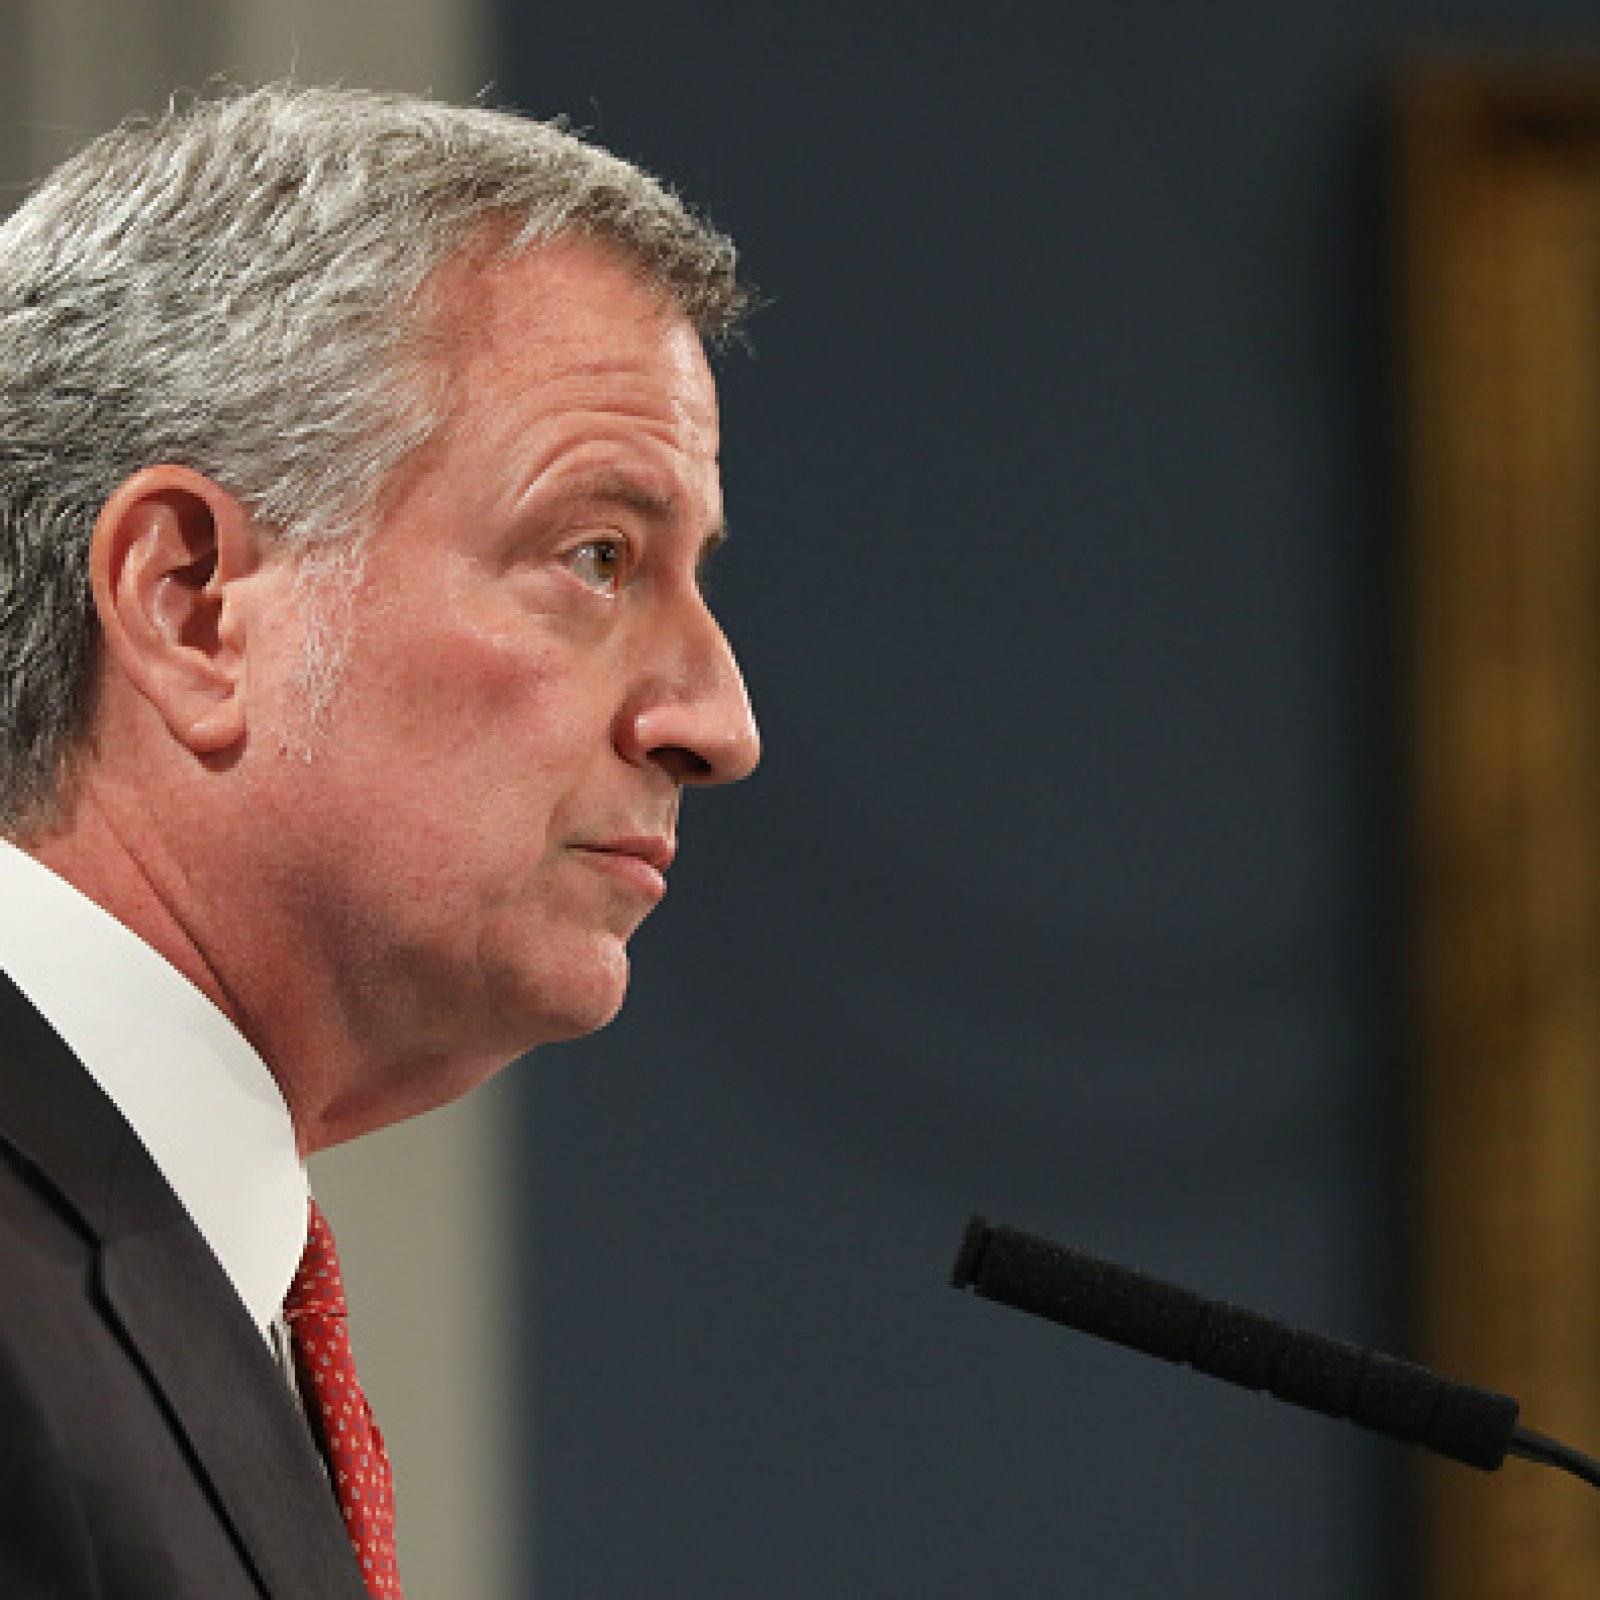 NYC Mayor Bill de Blasio Calls for Stricter Gun Control Laws